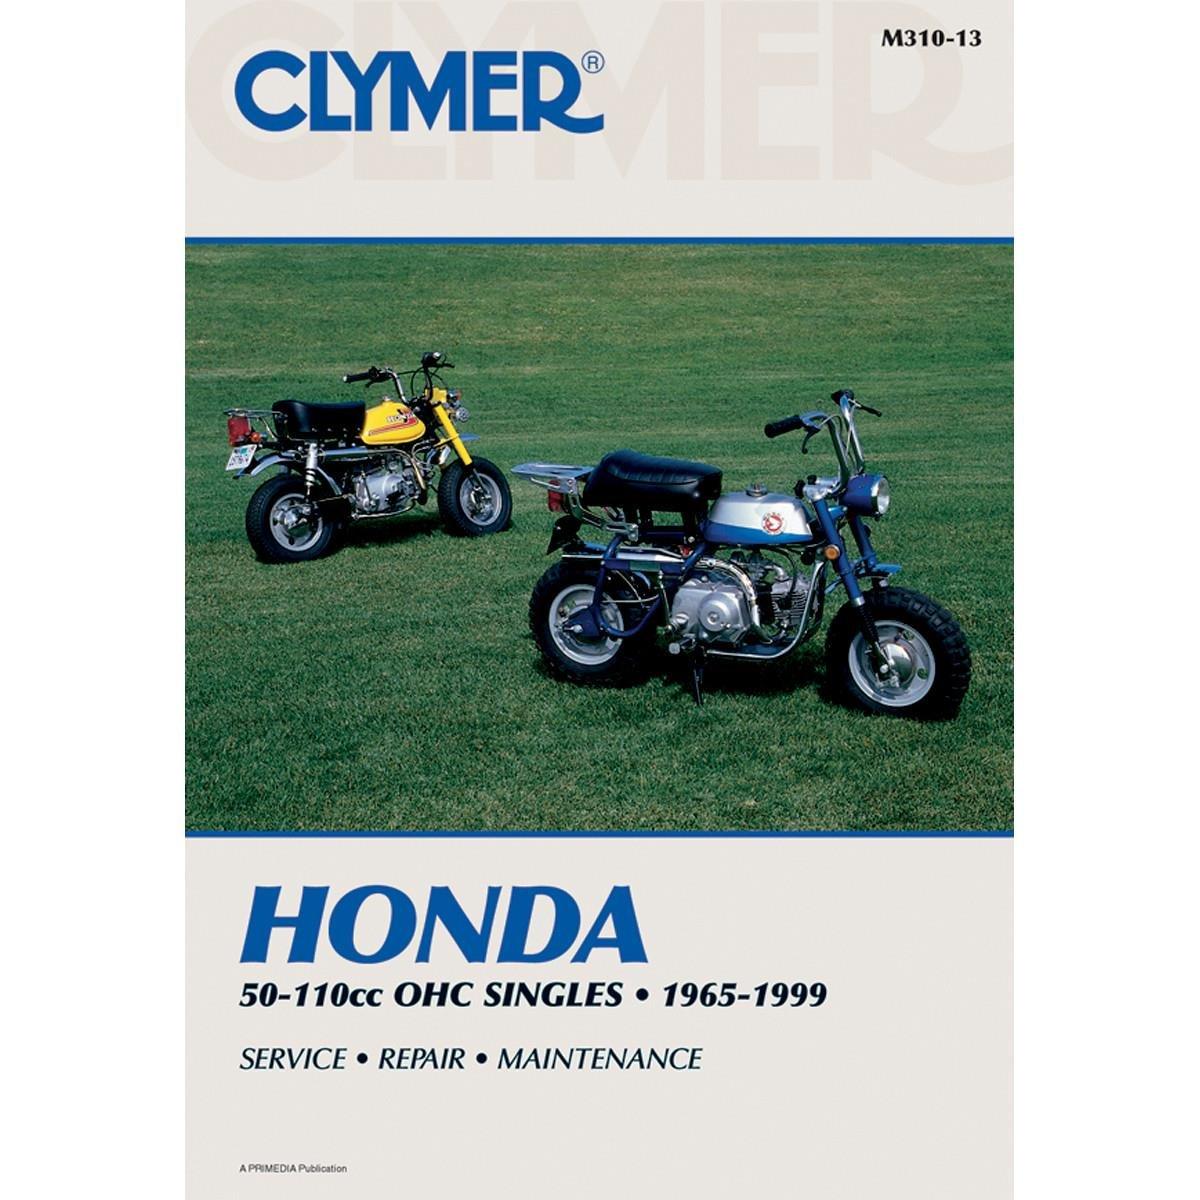 72-96 HONDA Z50: Clymer Service Manual